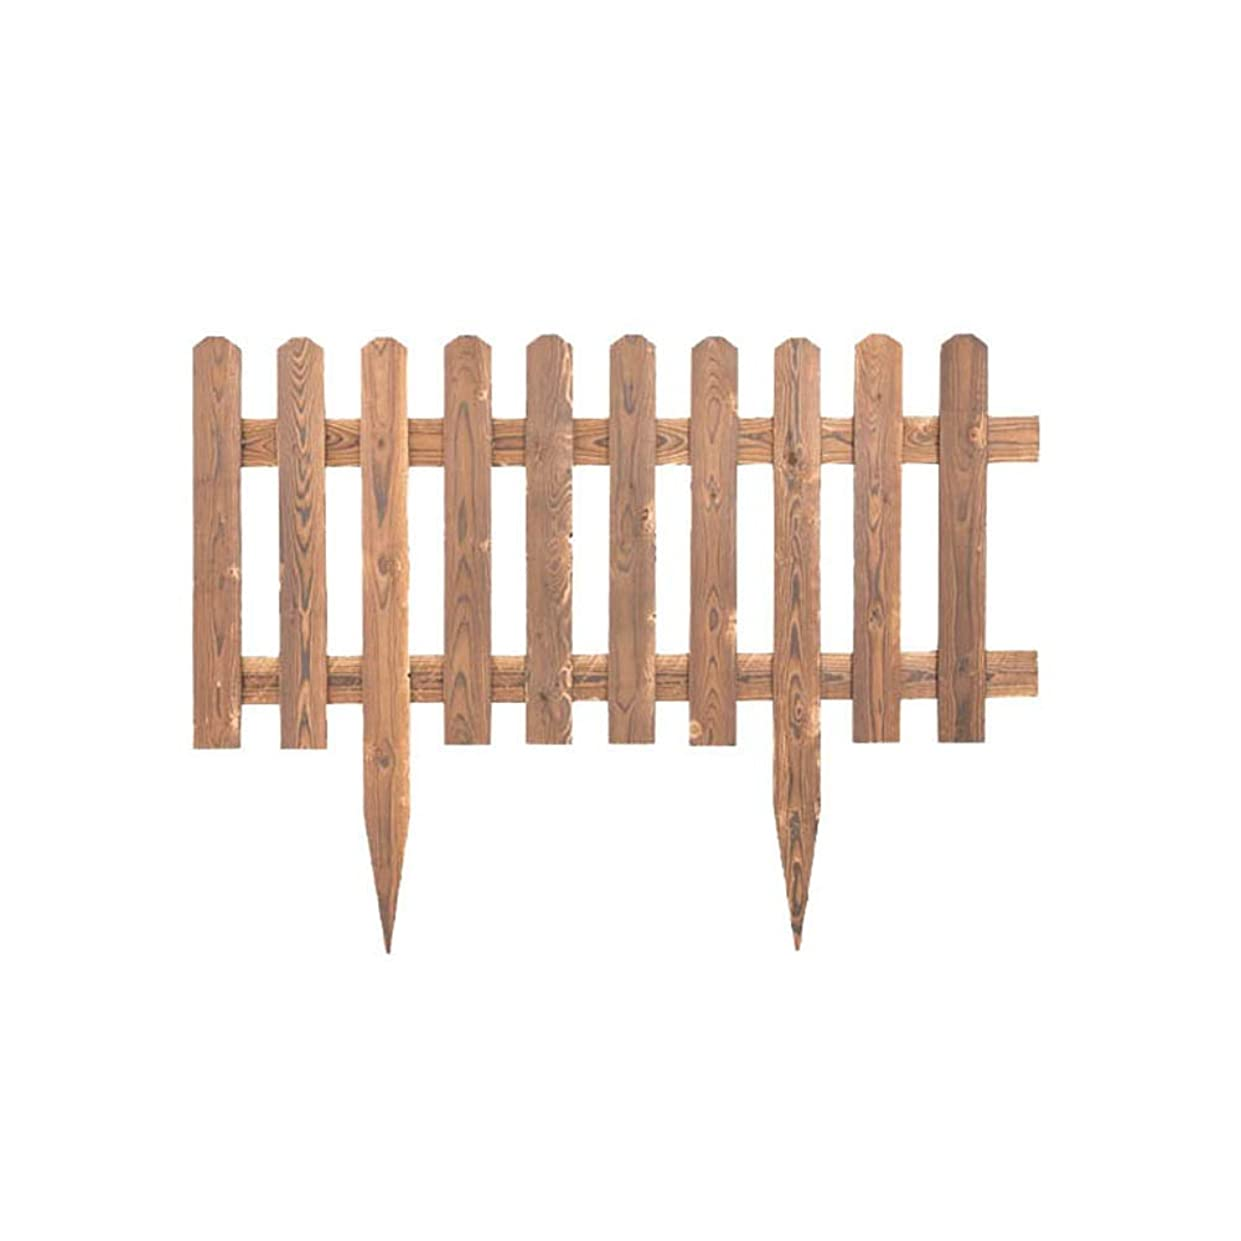 YYFANG 木製フェンス屋外装飾プラグイン木製フェンス芝生防食プロセスプラント保護全天候型含浸、4サイズ (Color : Brown, Size : 120x90cm)